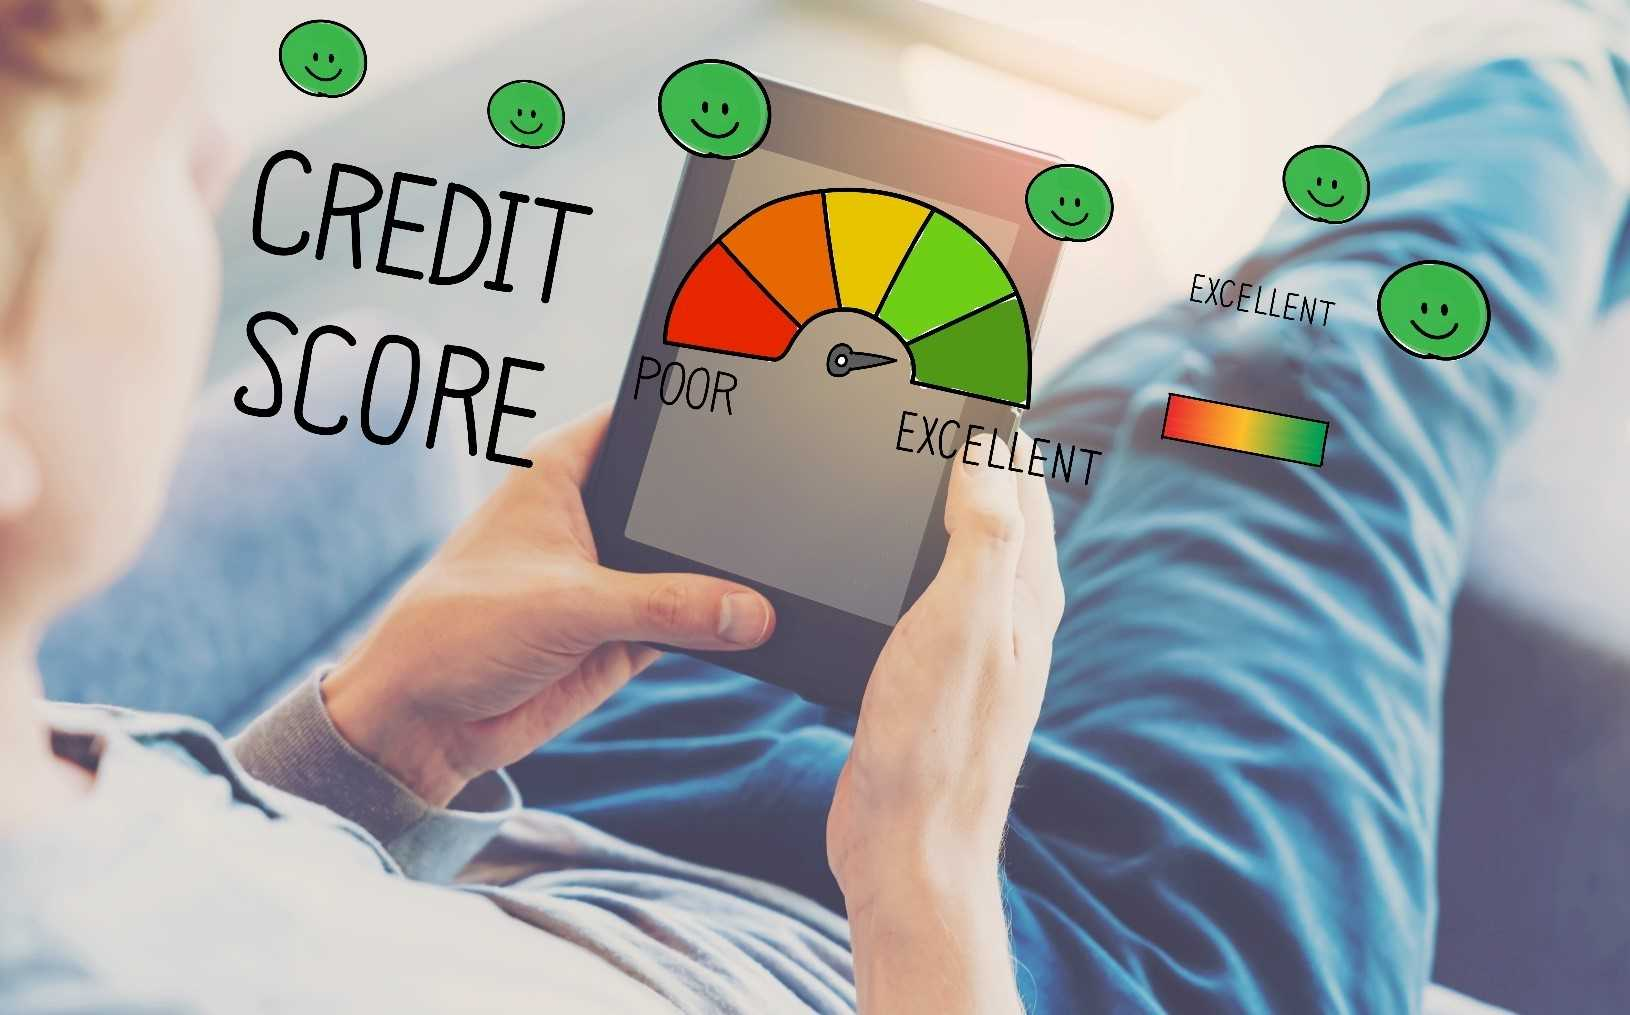 Man builds his credit score